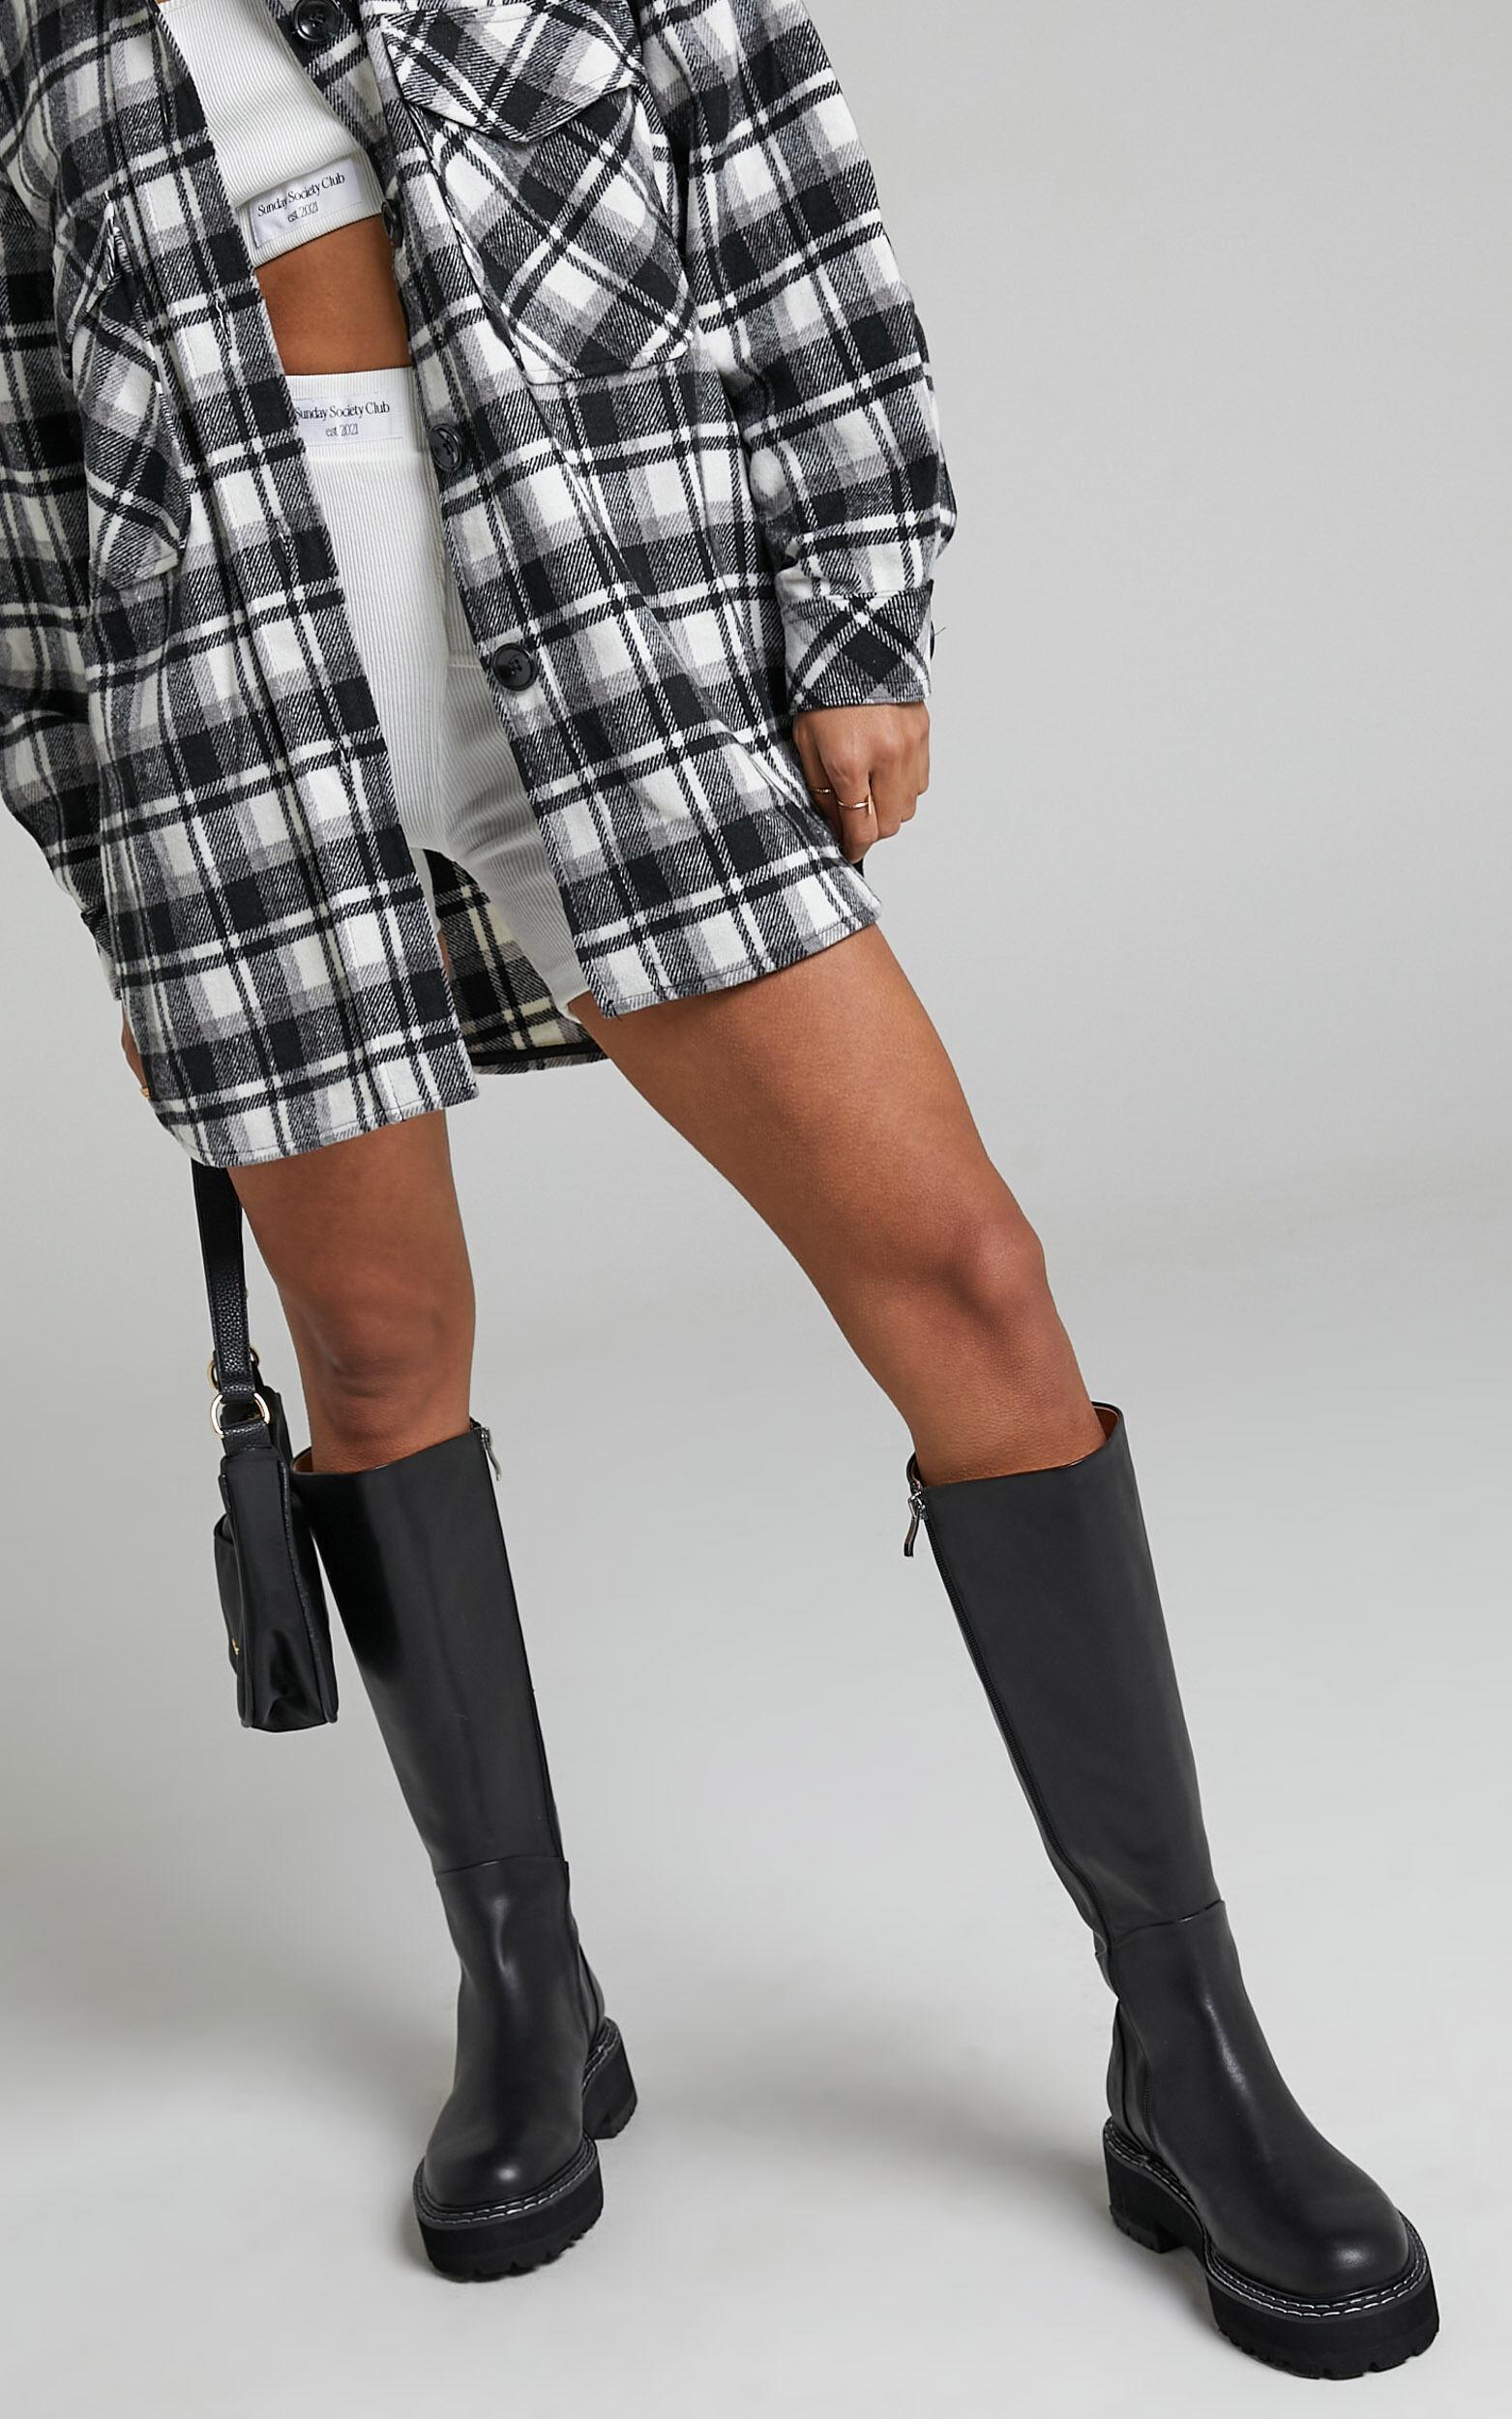 Alias Mae - Rohan Boots in Black Burnished - 10.5, BLK1, super-hi-res image number null